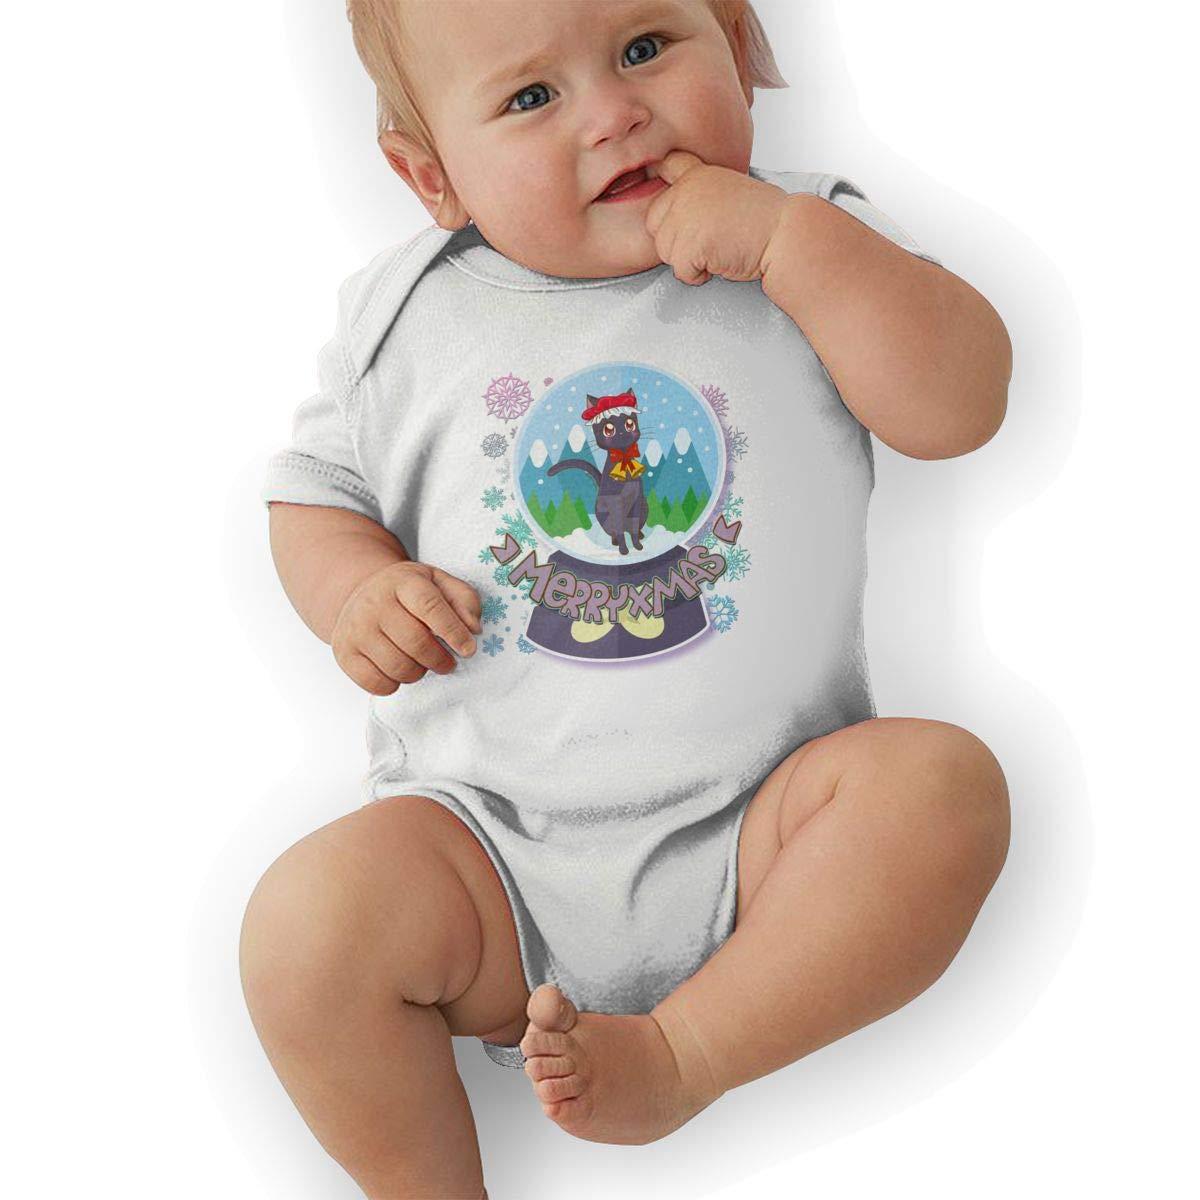 Newborn Baby Boys Bodysuit Short-Sleeve Onesie Christmas Kitten Snow Globe Print Outfit Winter Pajamas